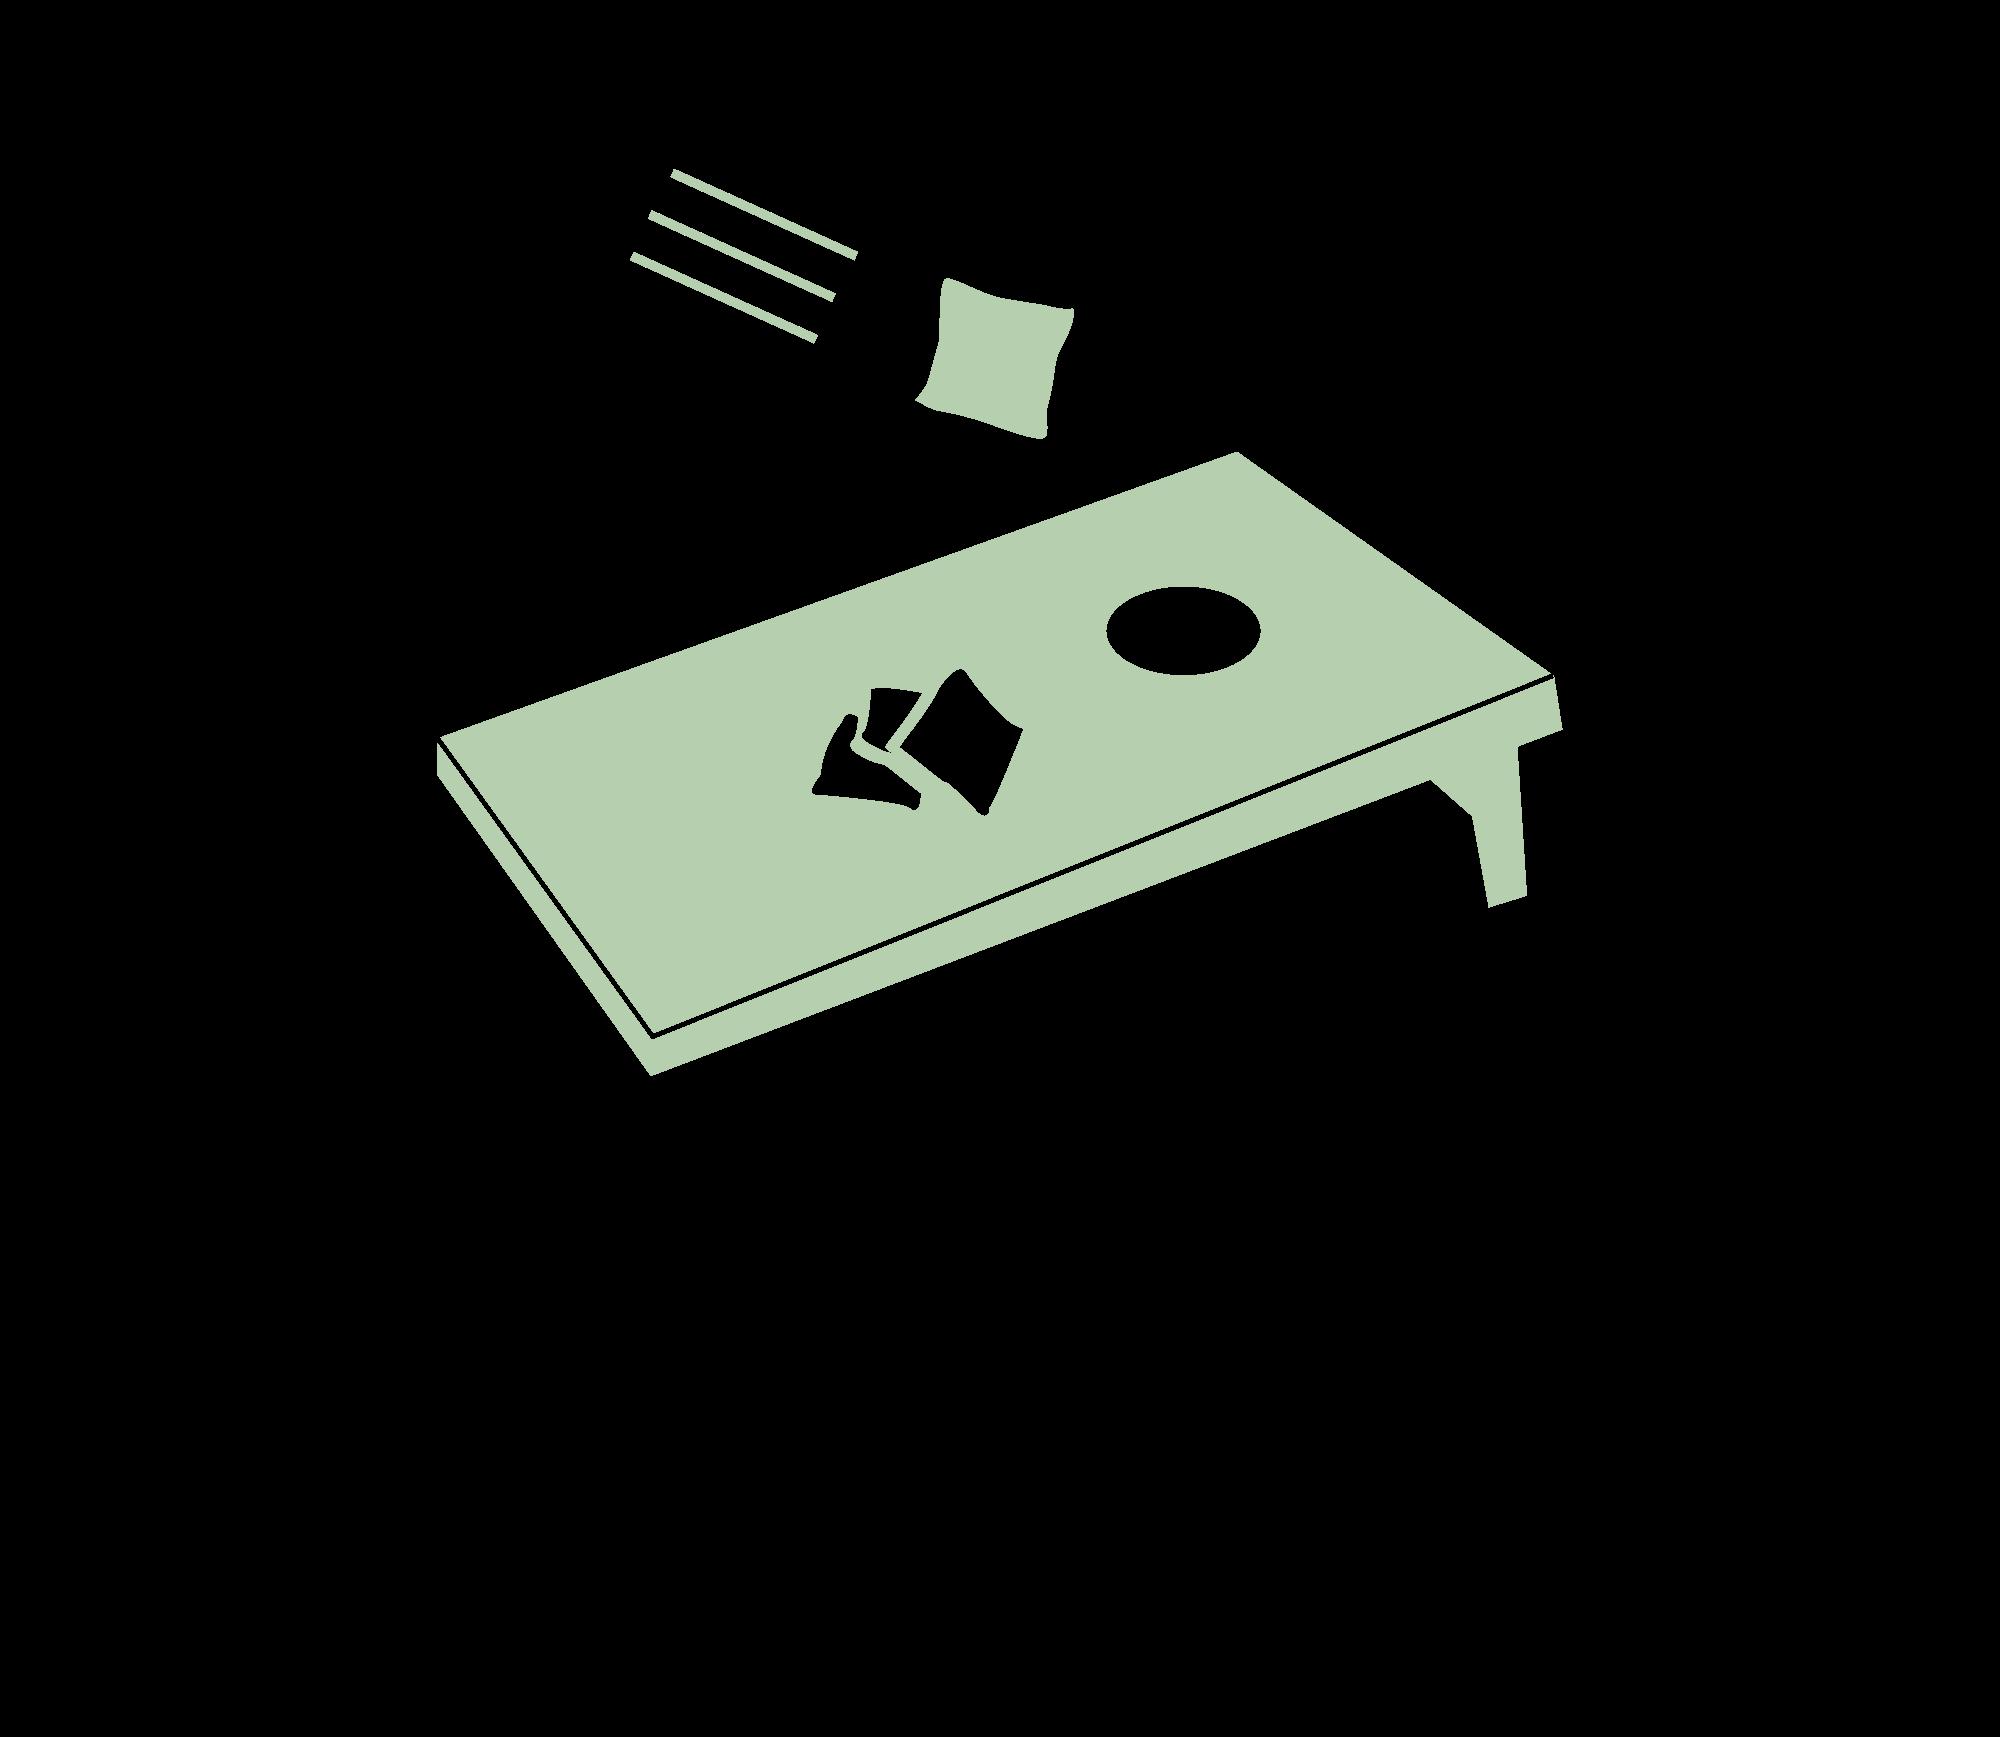 CORNHOLE-logo.png